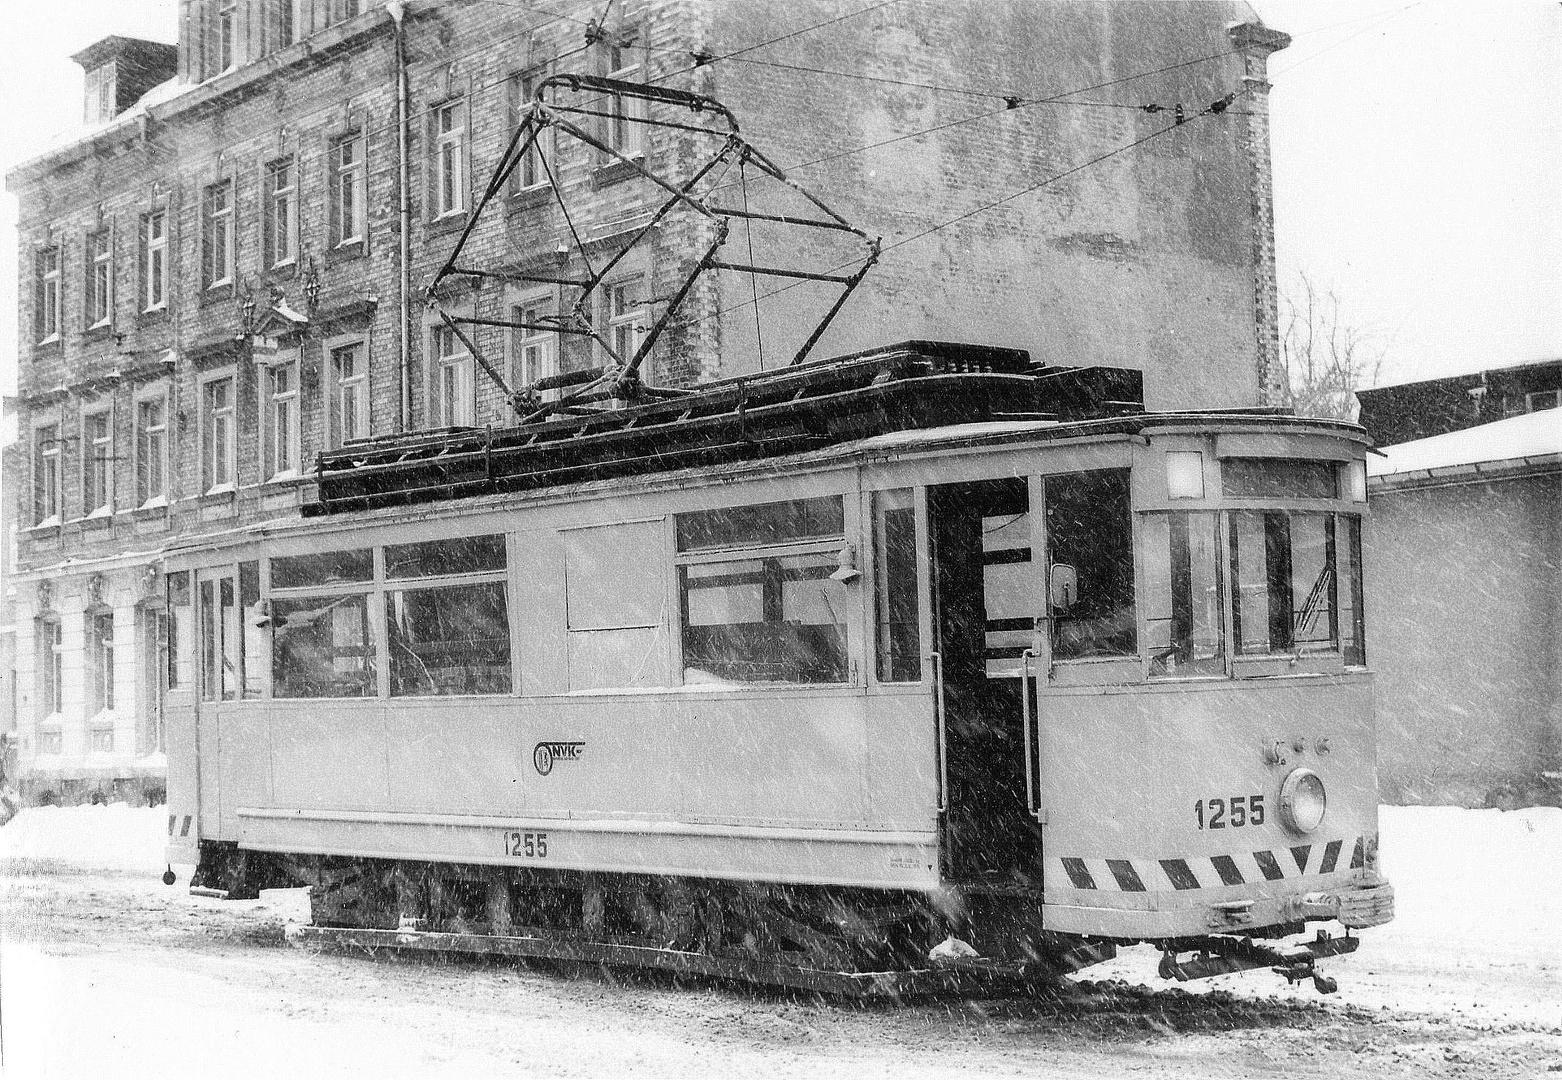 1985 1255 Karl Marx Stadt